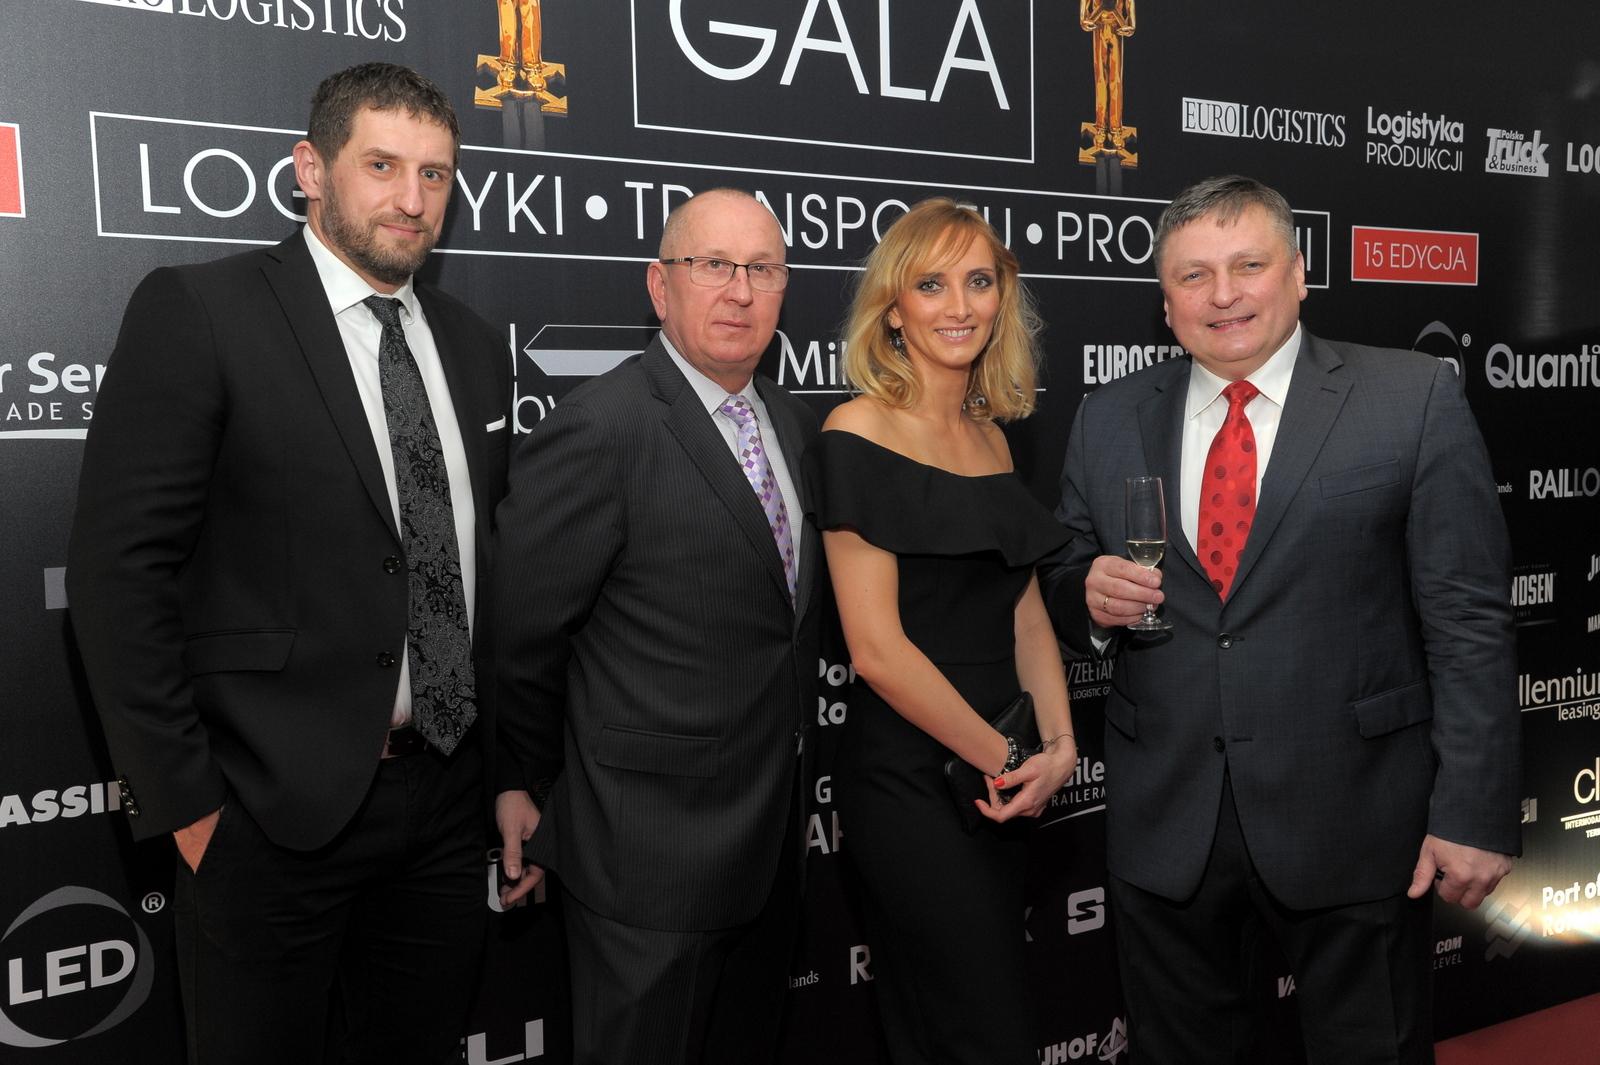 GALERIA 2016 | Gala Logistyki